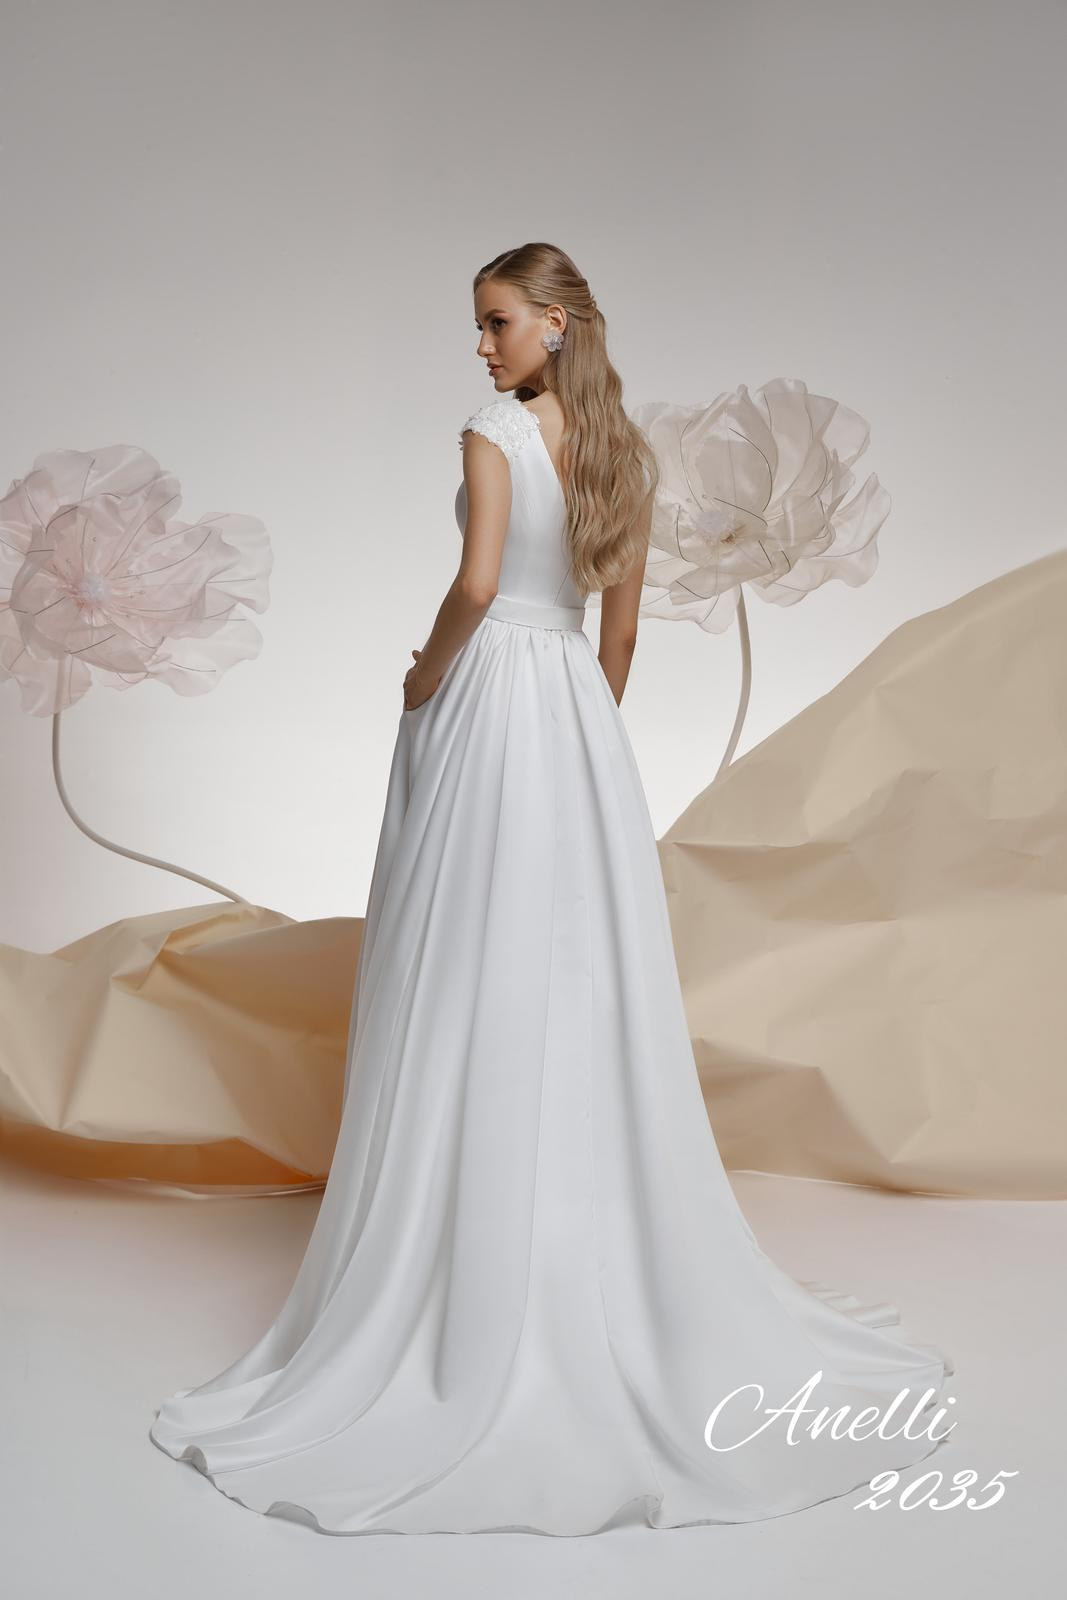 Svadobné šaty - Imagine 2035 - Obrázok č. 3